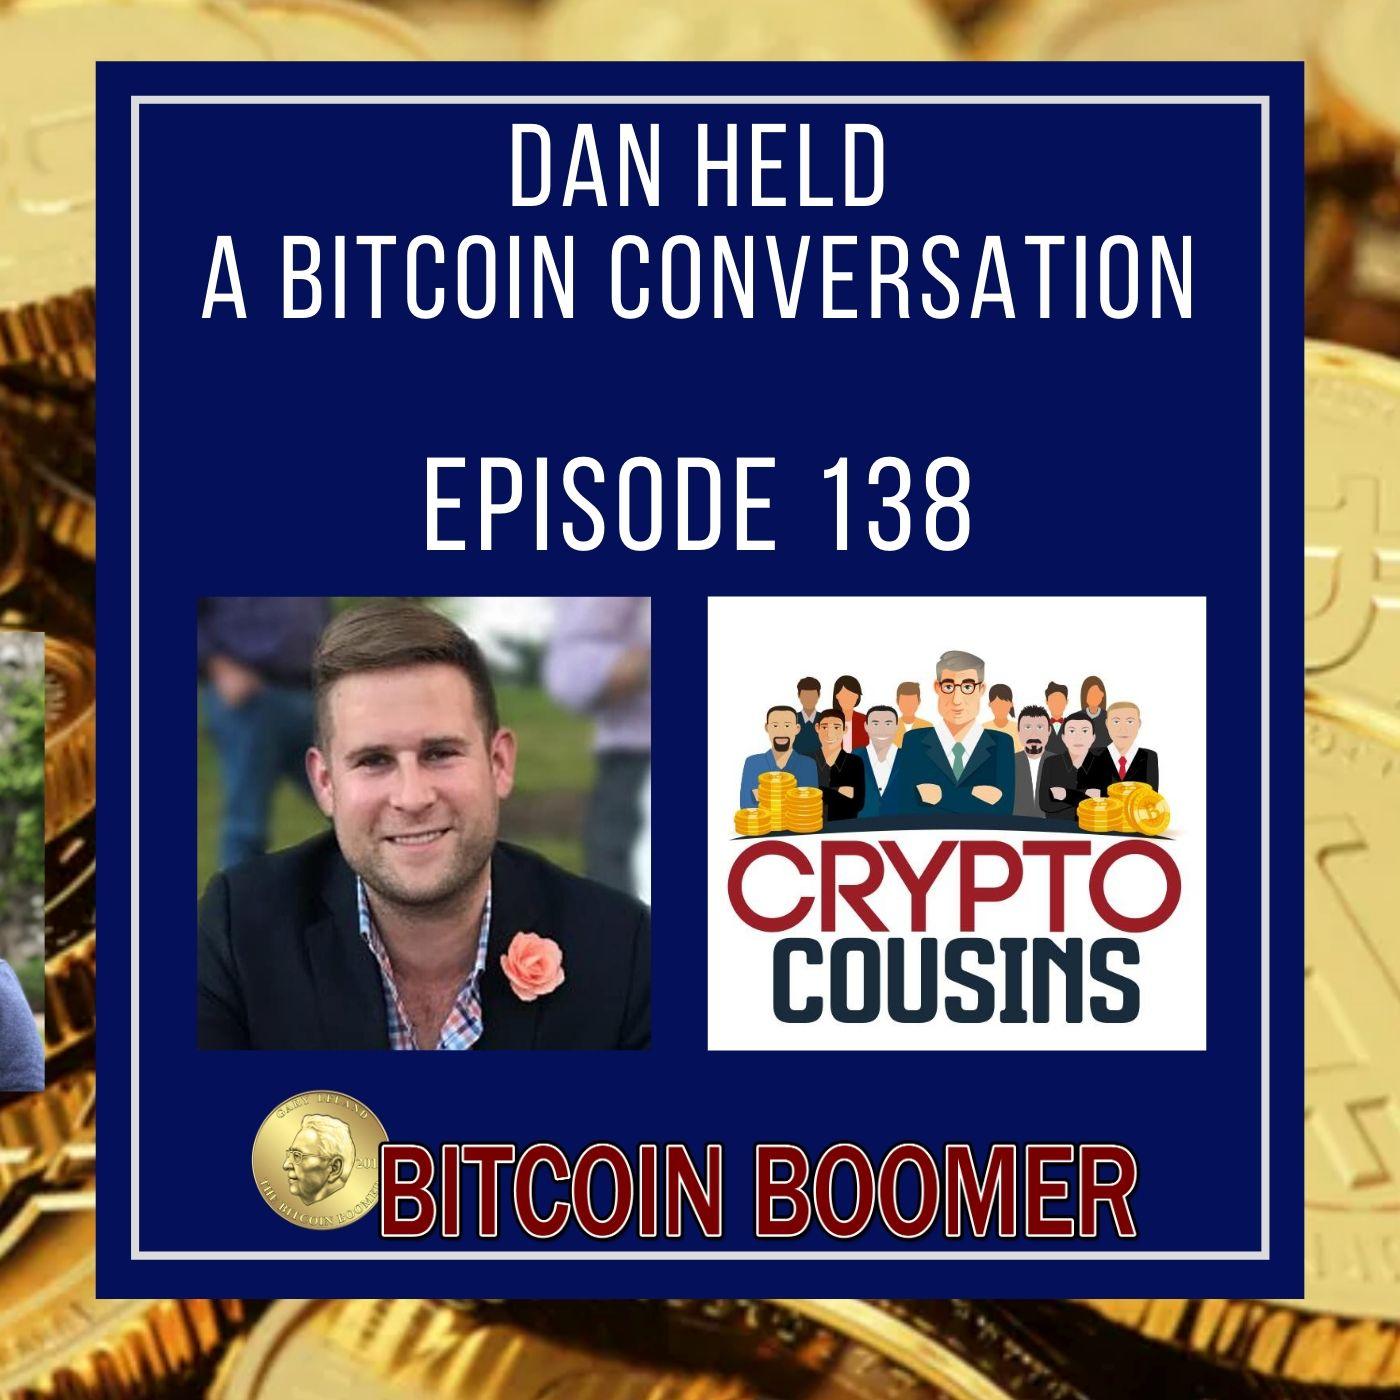 A Bitcoin Conversation - Dan Held